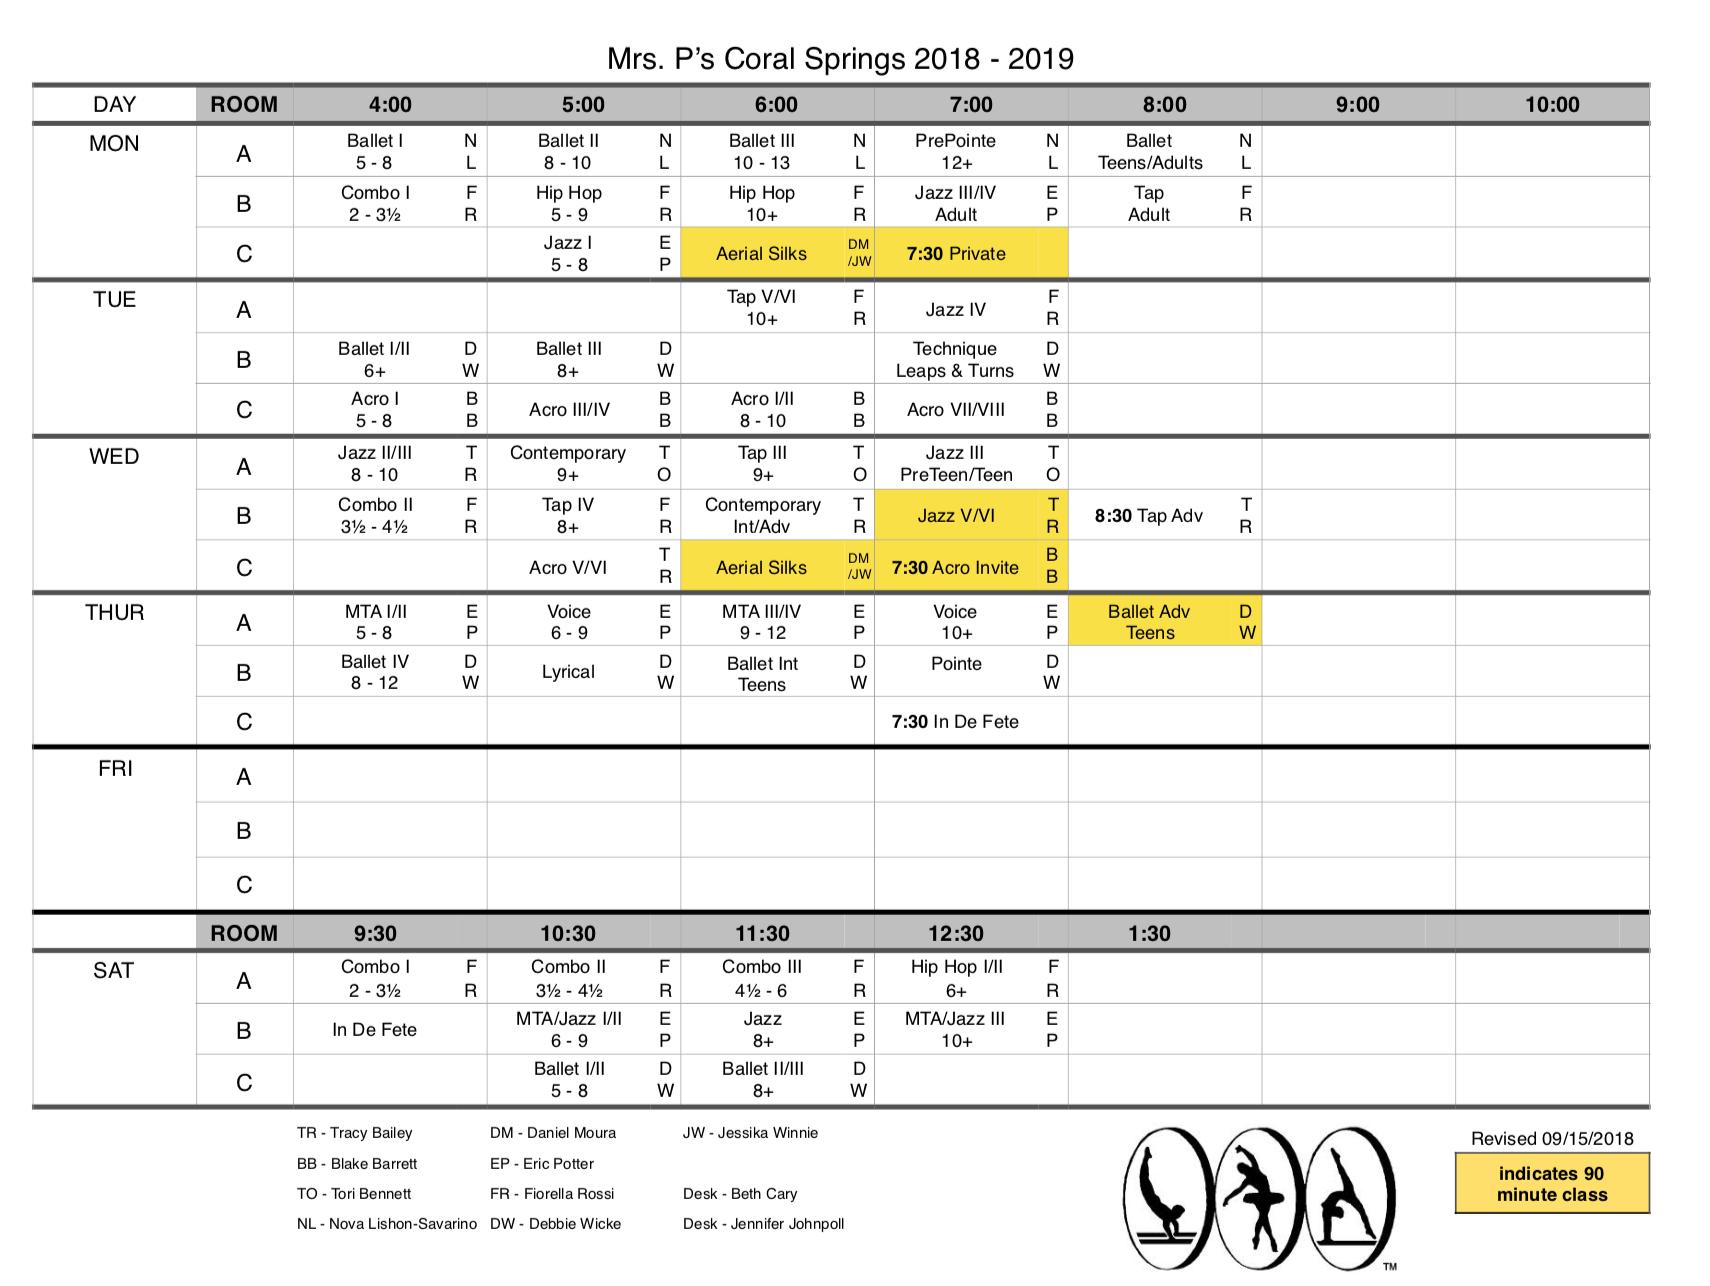 2018 - 2019 Schedule Updated 09/15/2018